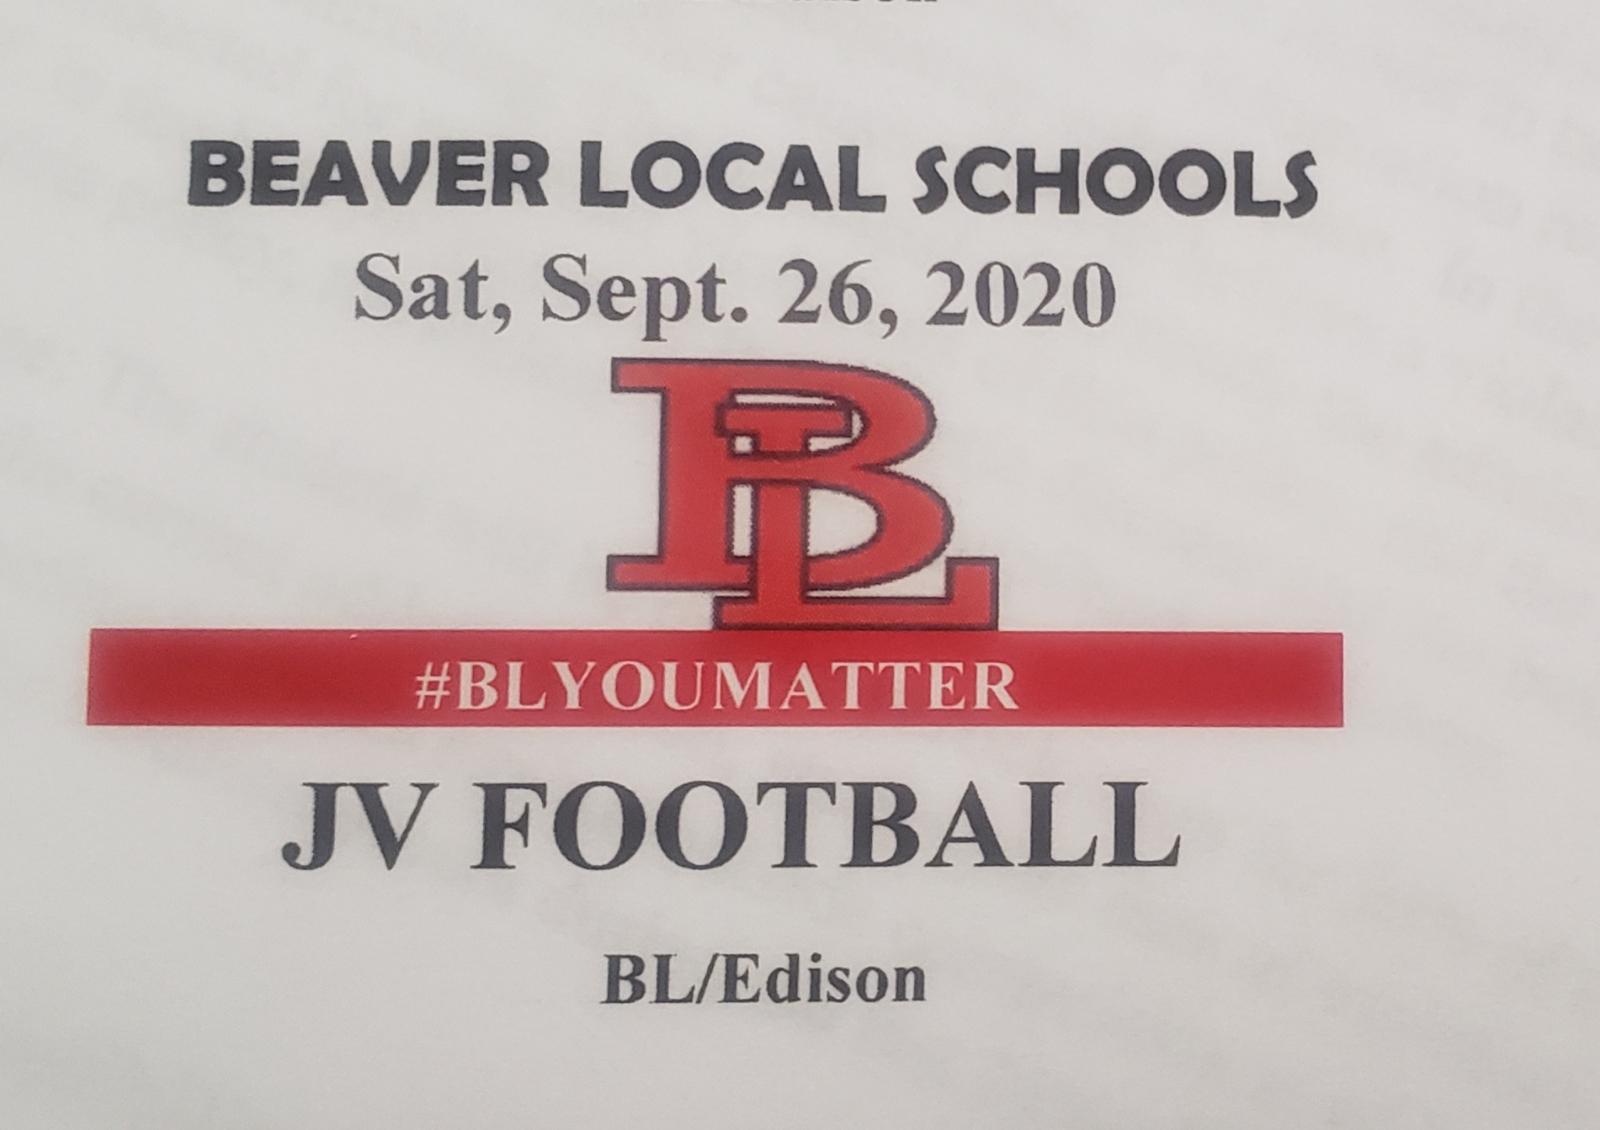 JVFB Saturday at Beaver Local